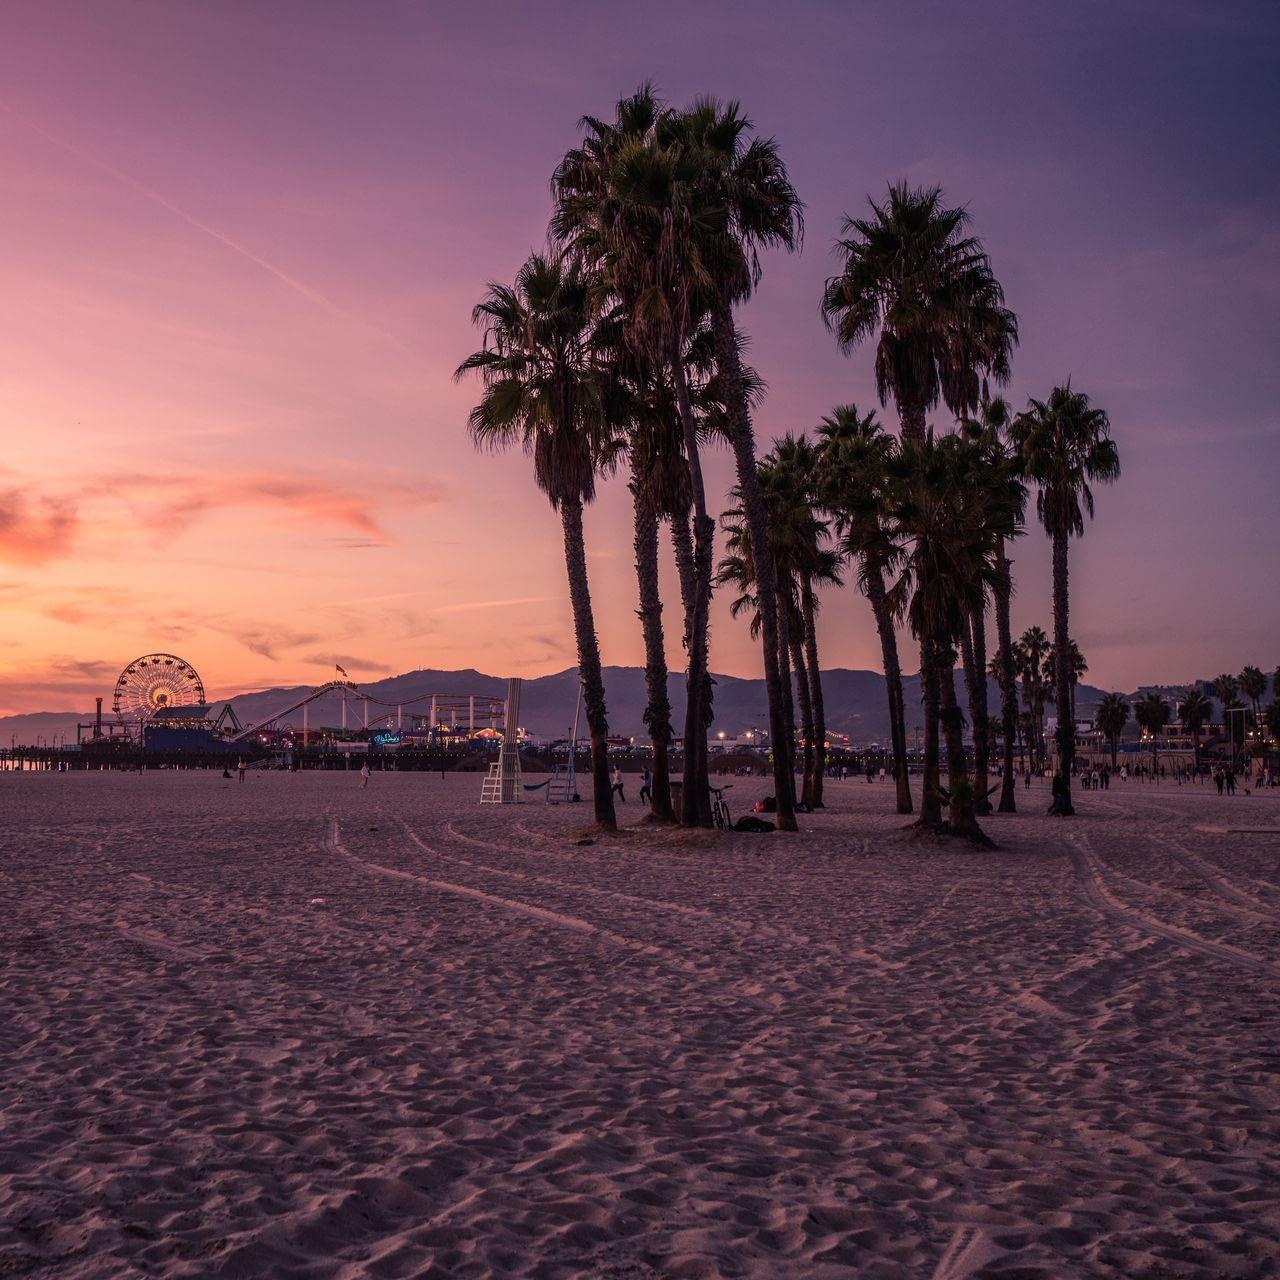 venice beach palm trees at sunset